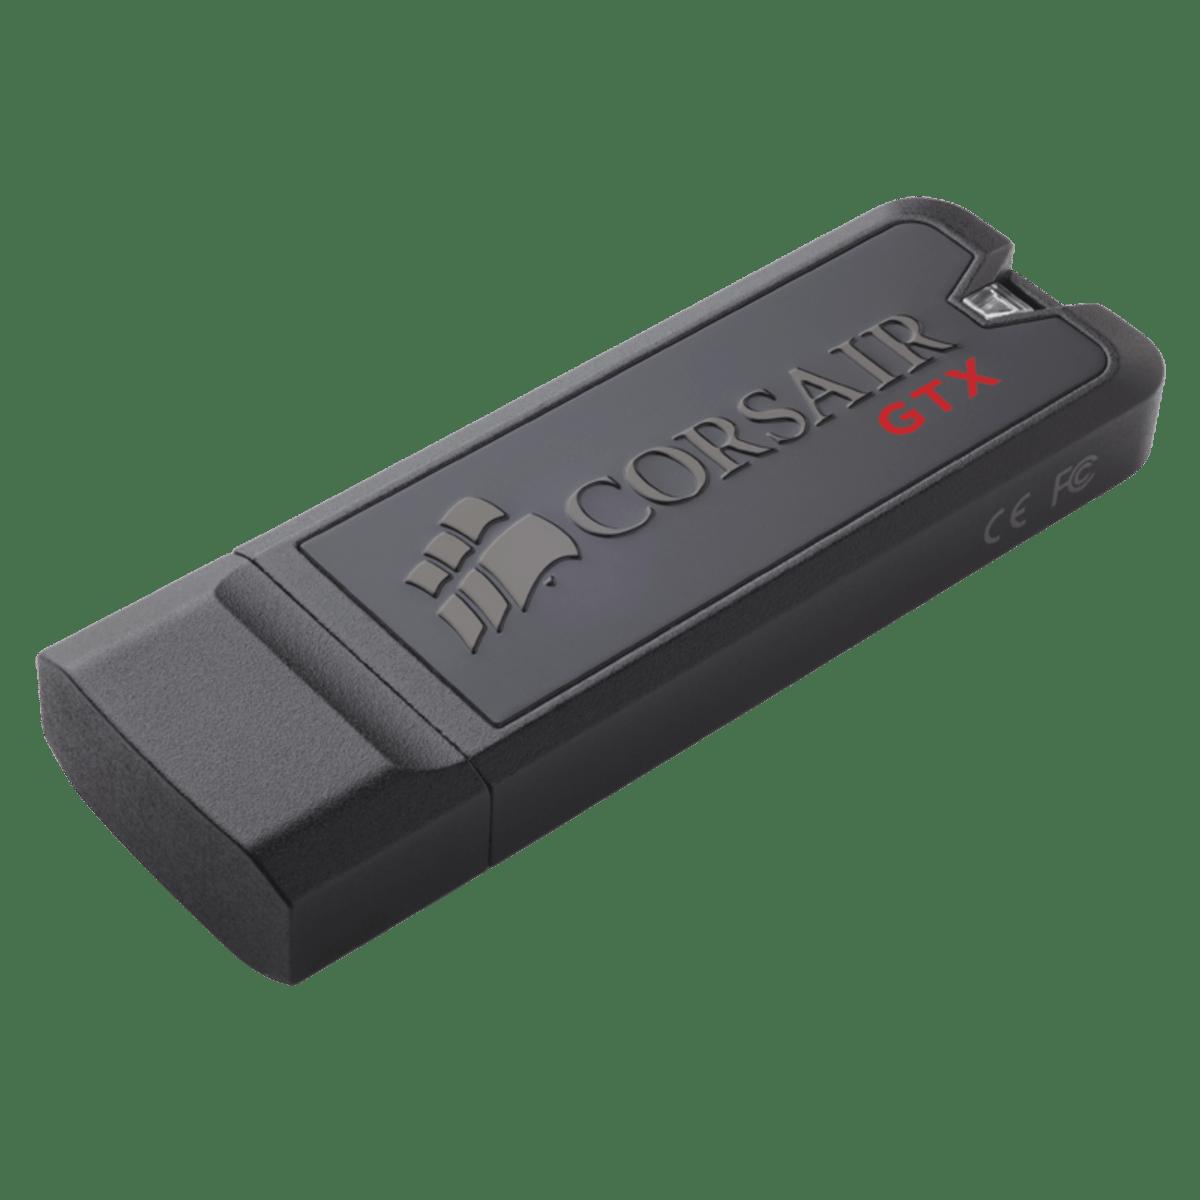 Voyager GTX